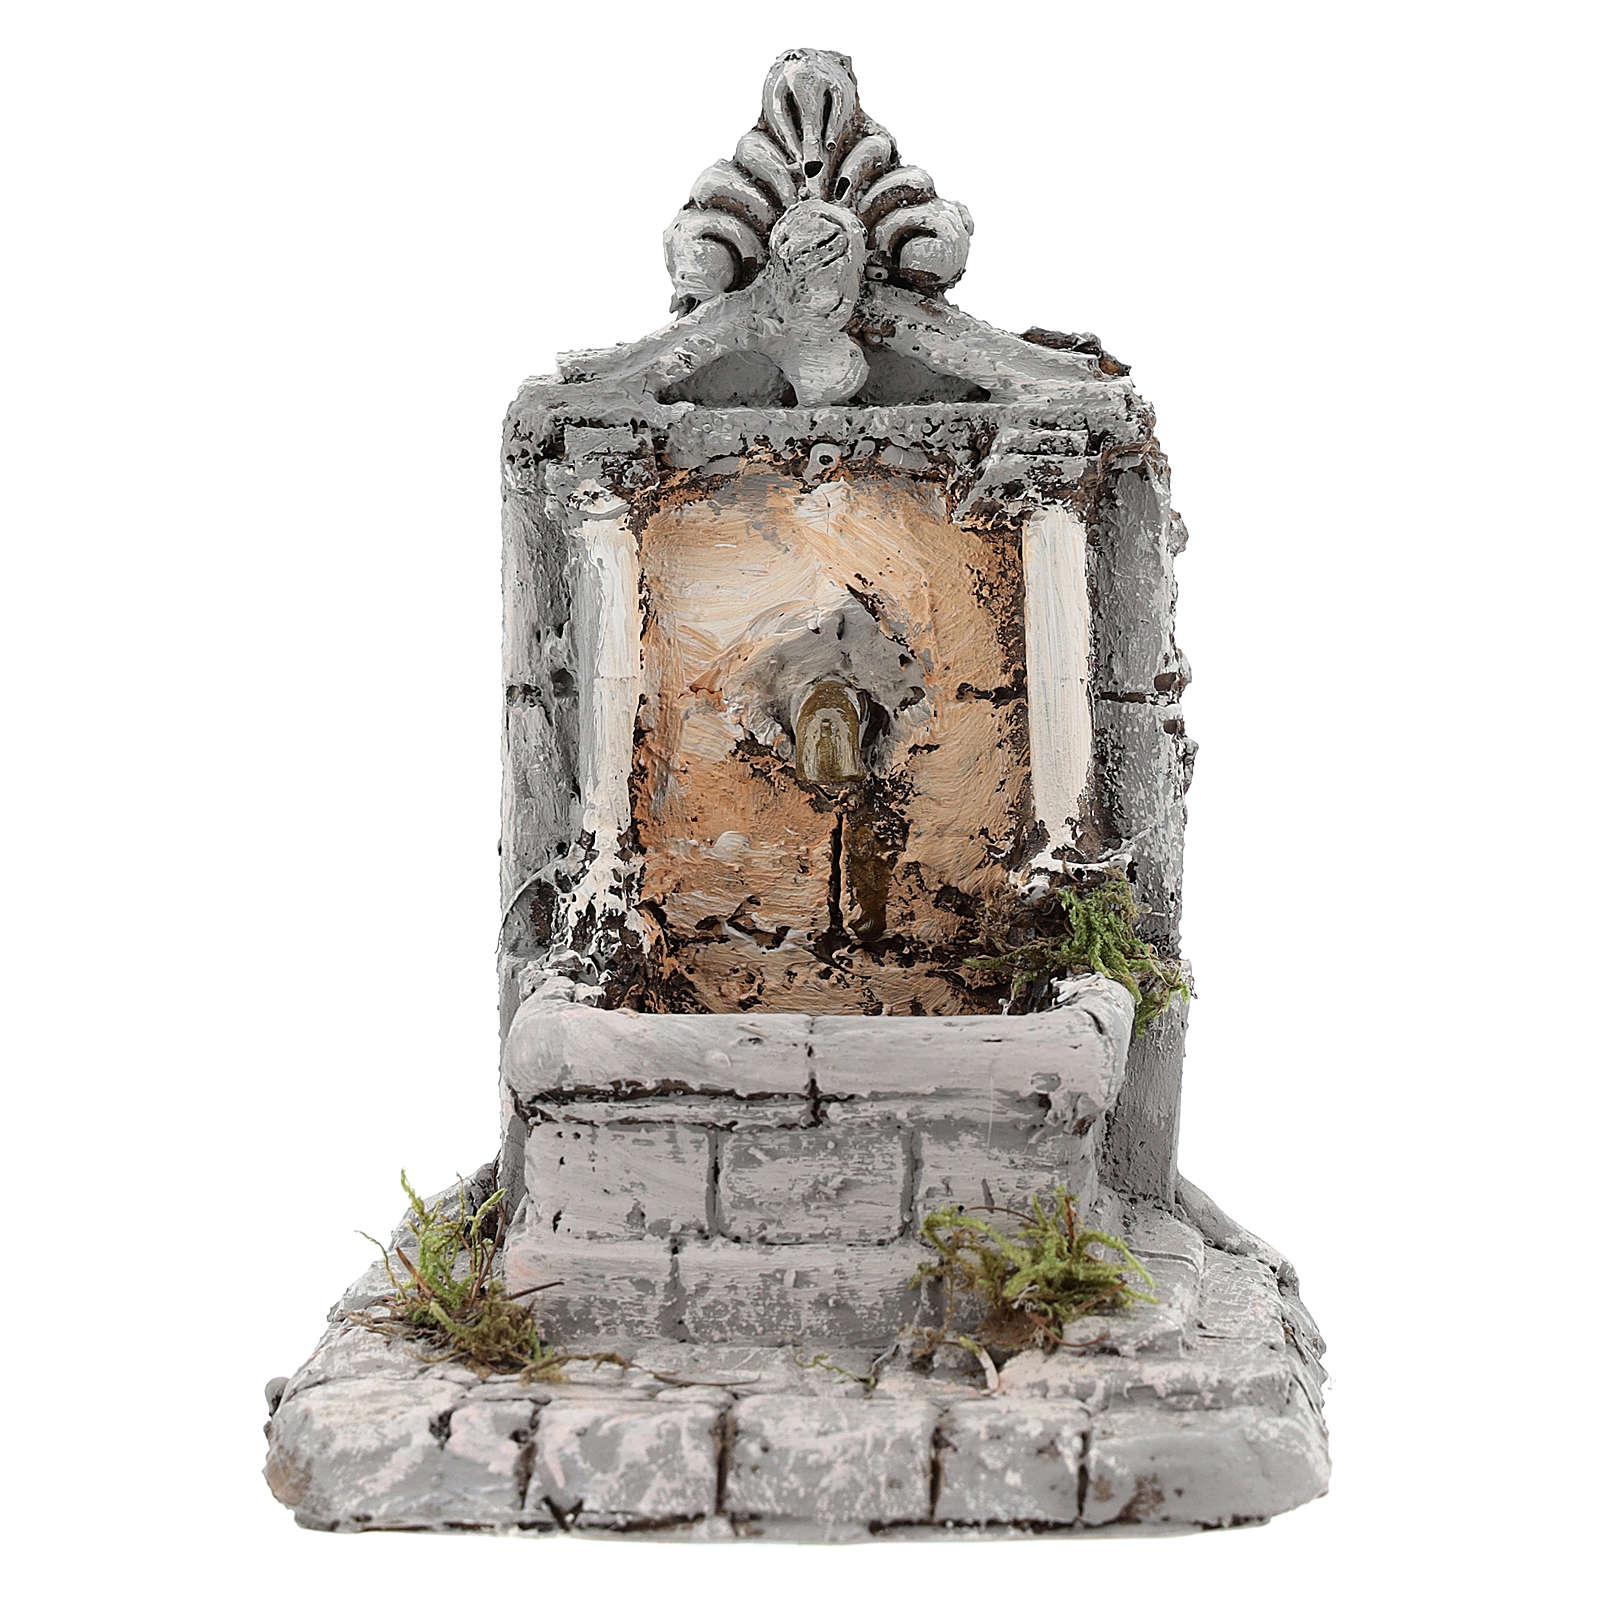 Fountain in resin 17x13x16cm 4